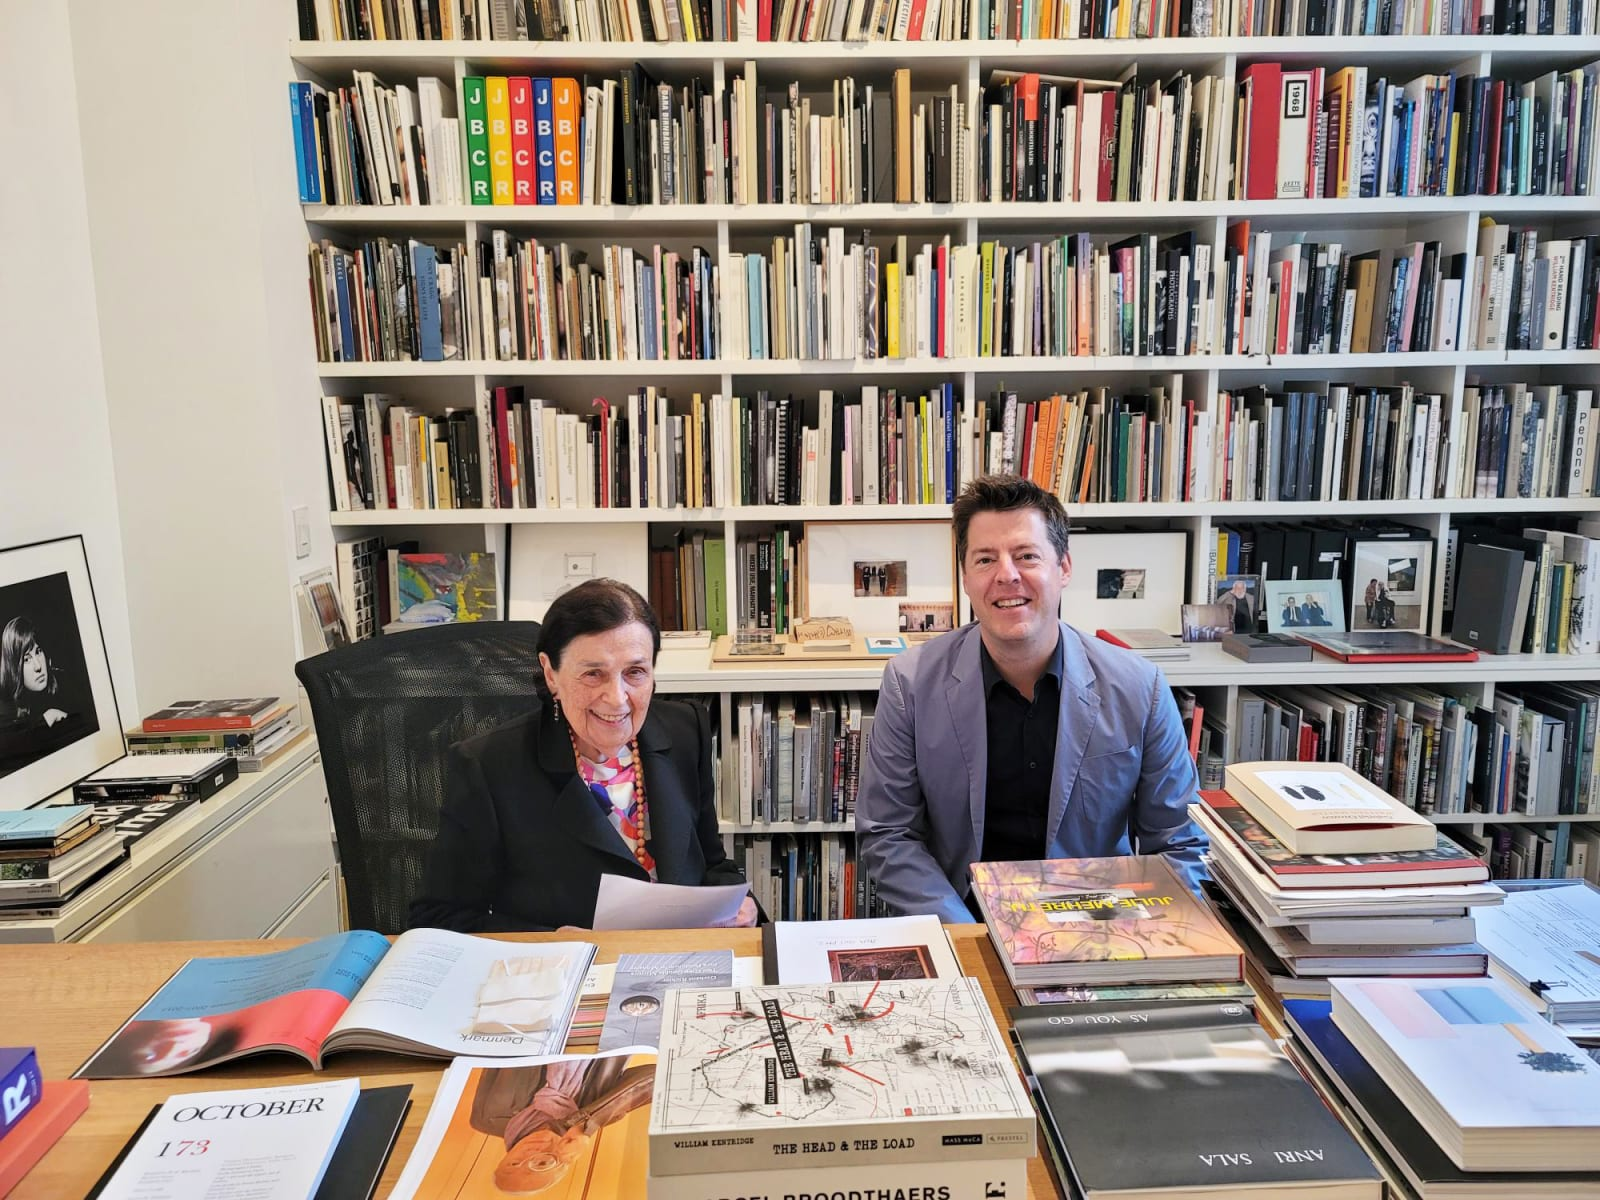 Marian Goodman and Philipp Kaiser